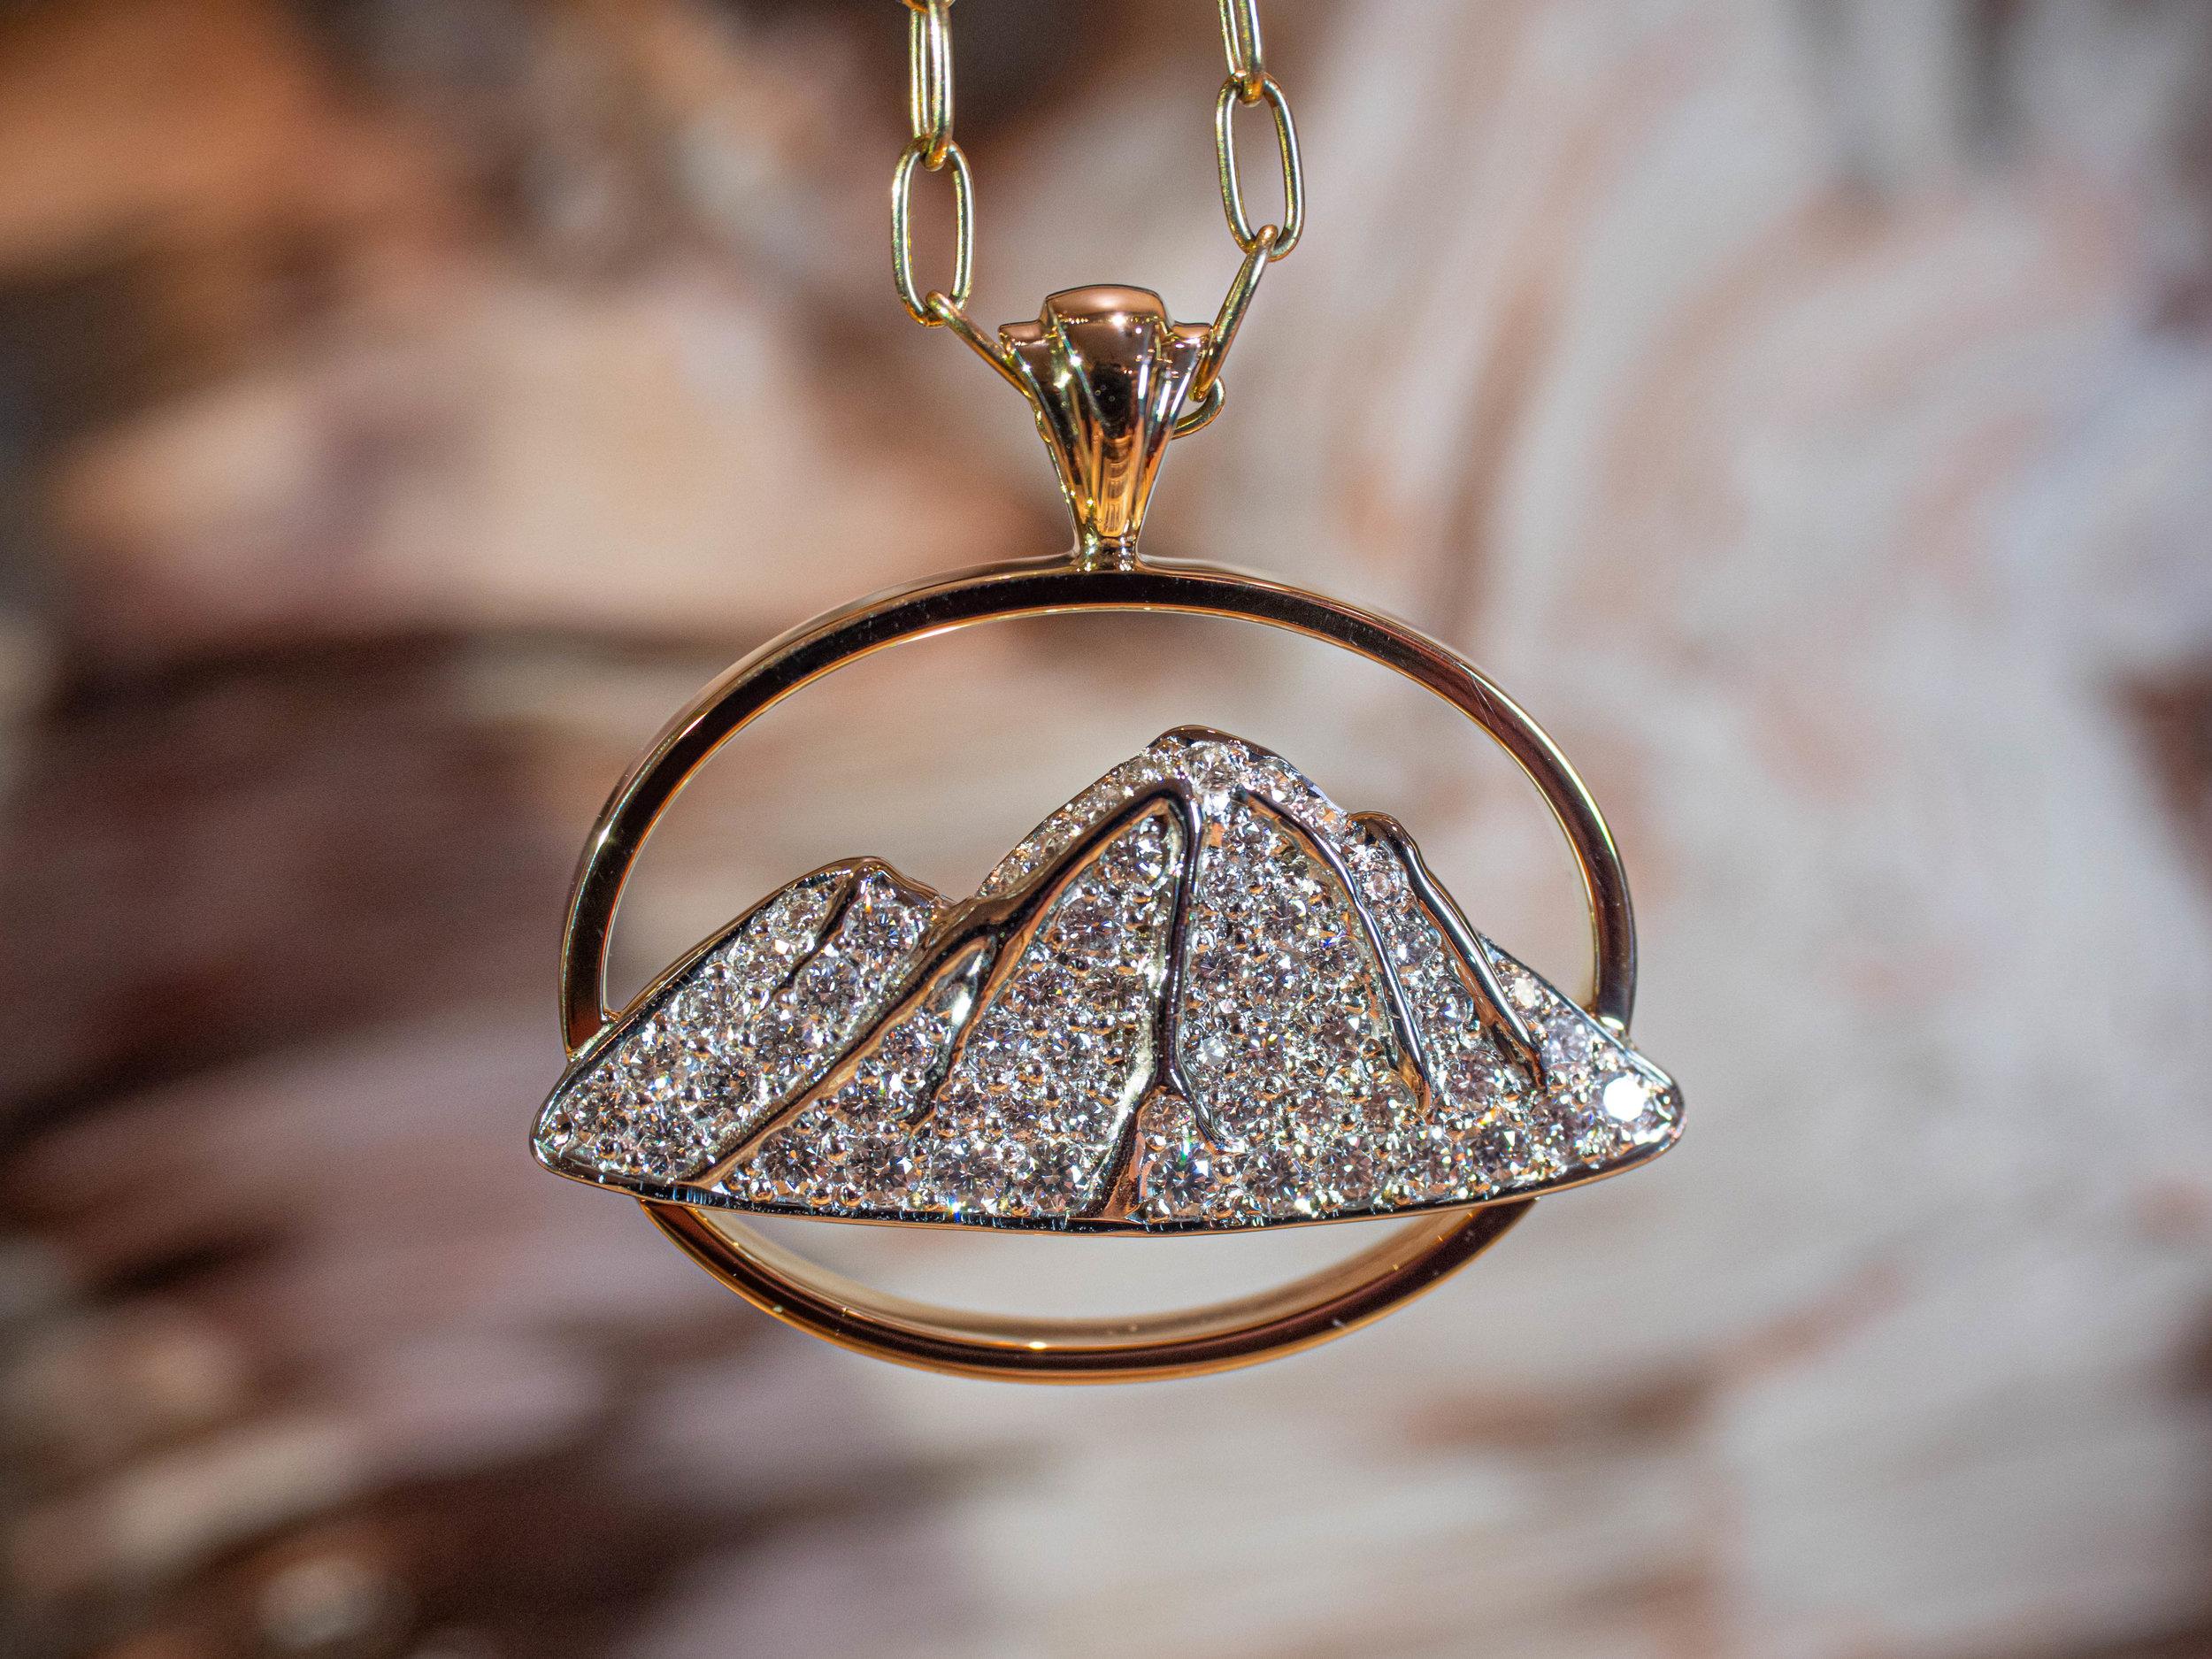 Mount Shasta Jewelry